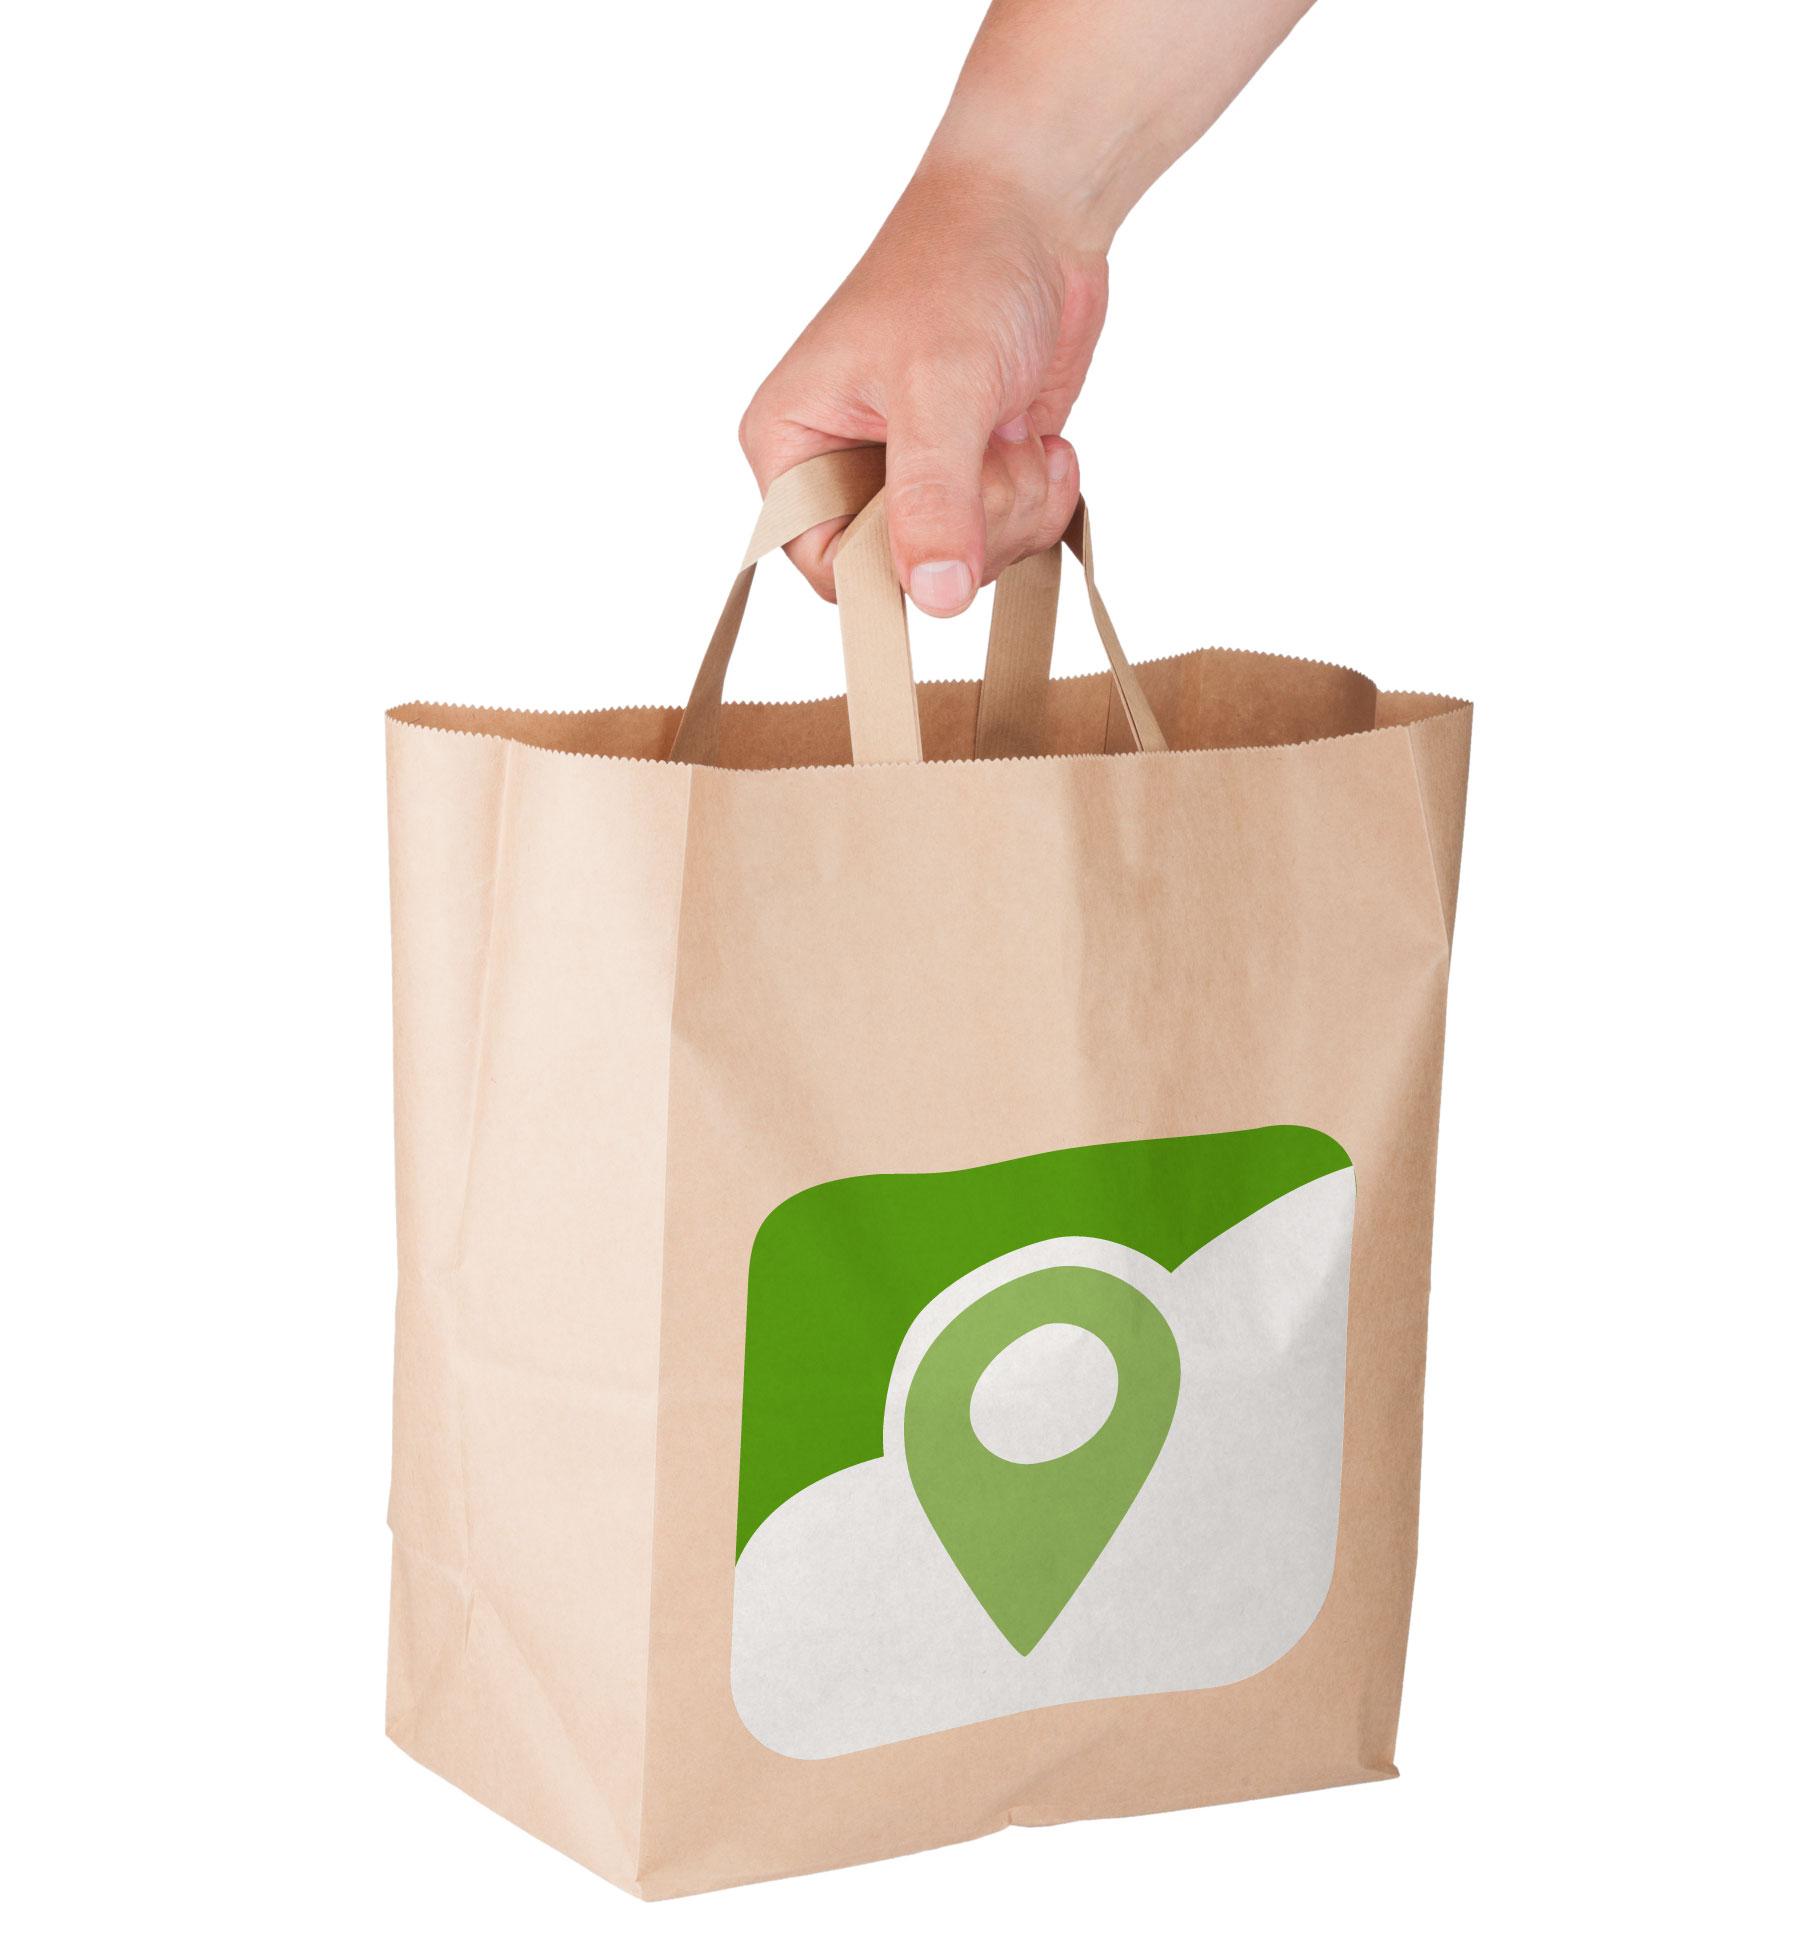 BagMaker-Delivery-Website-2017.jpg